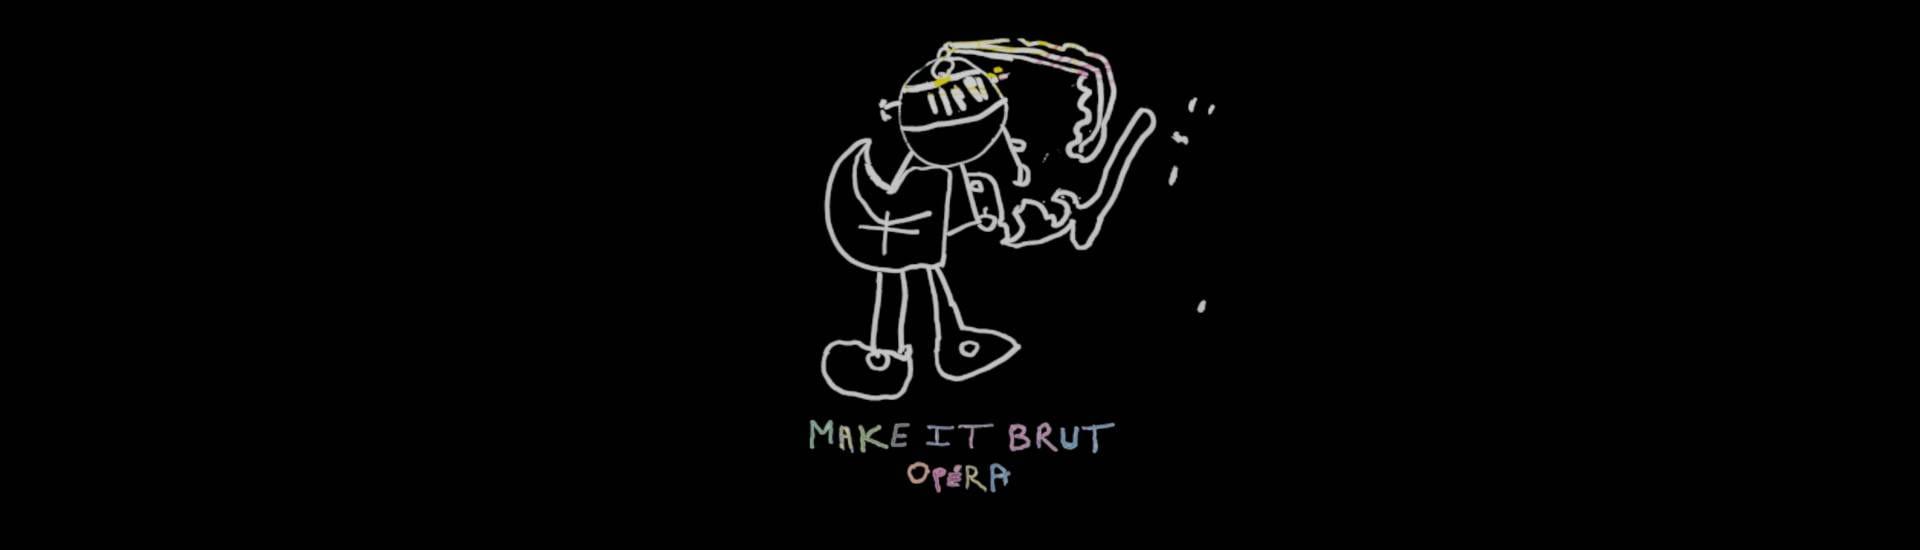 Make it brut Opera